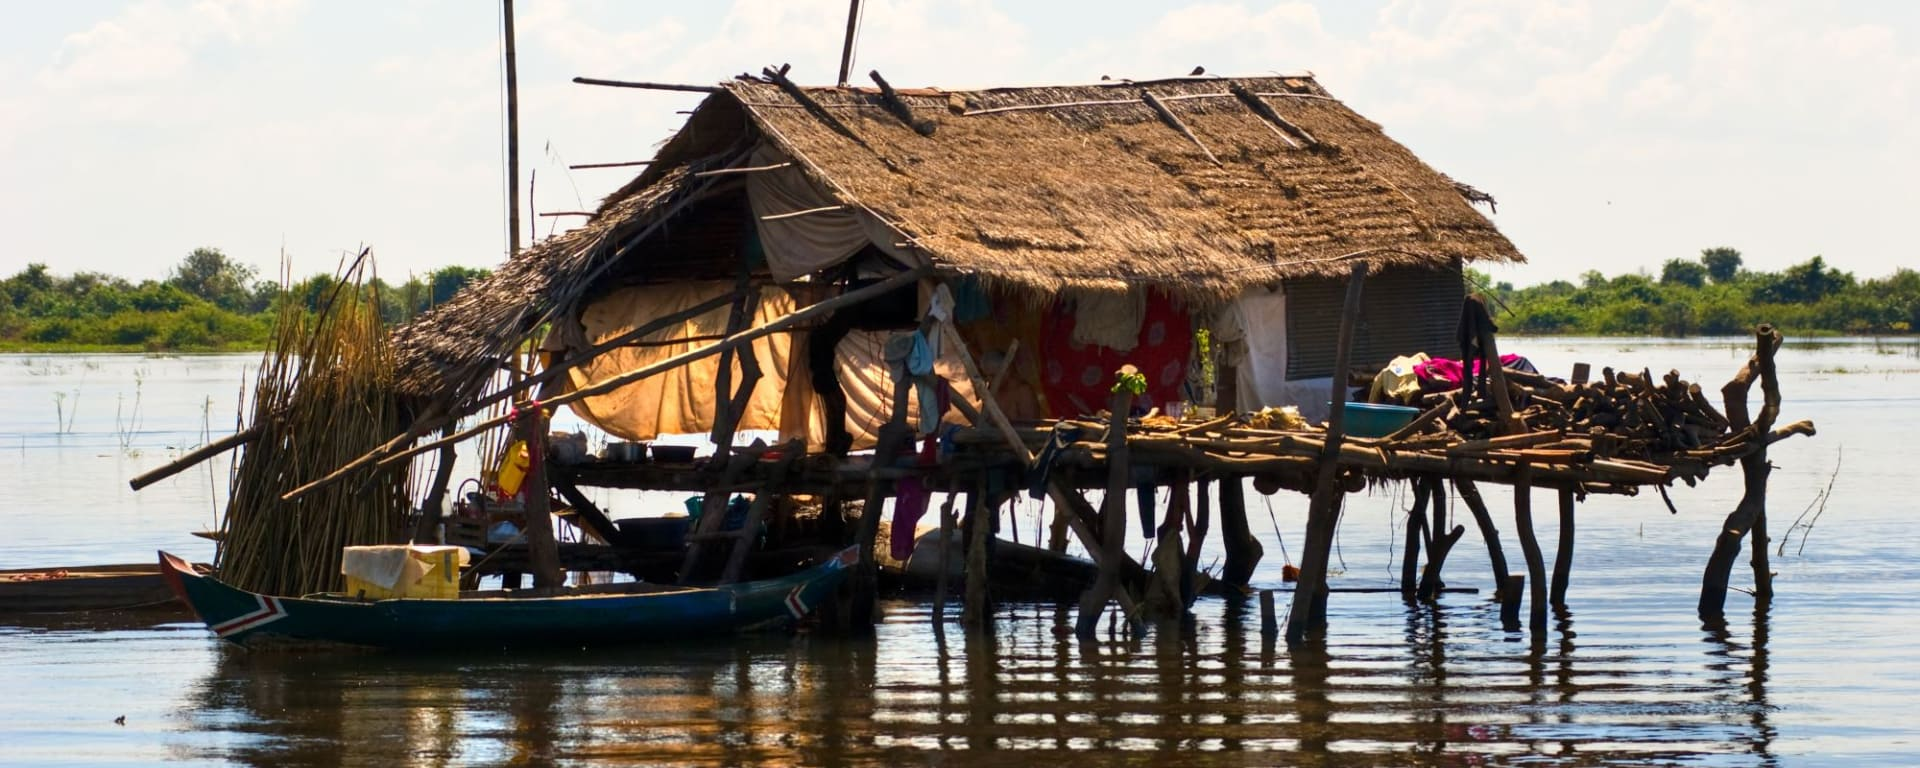 Battambang & Banteay Chhmar im Luxuszelt ab Siem Reap: Tonle Sap local house